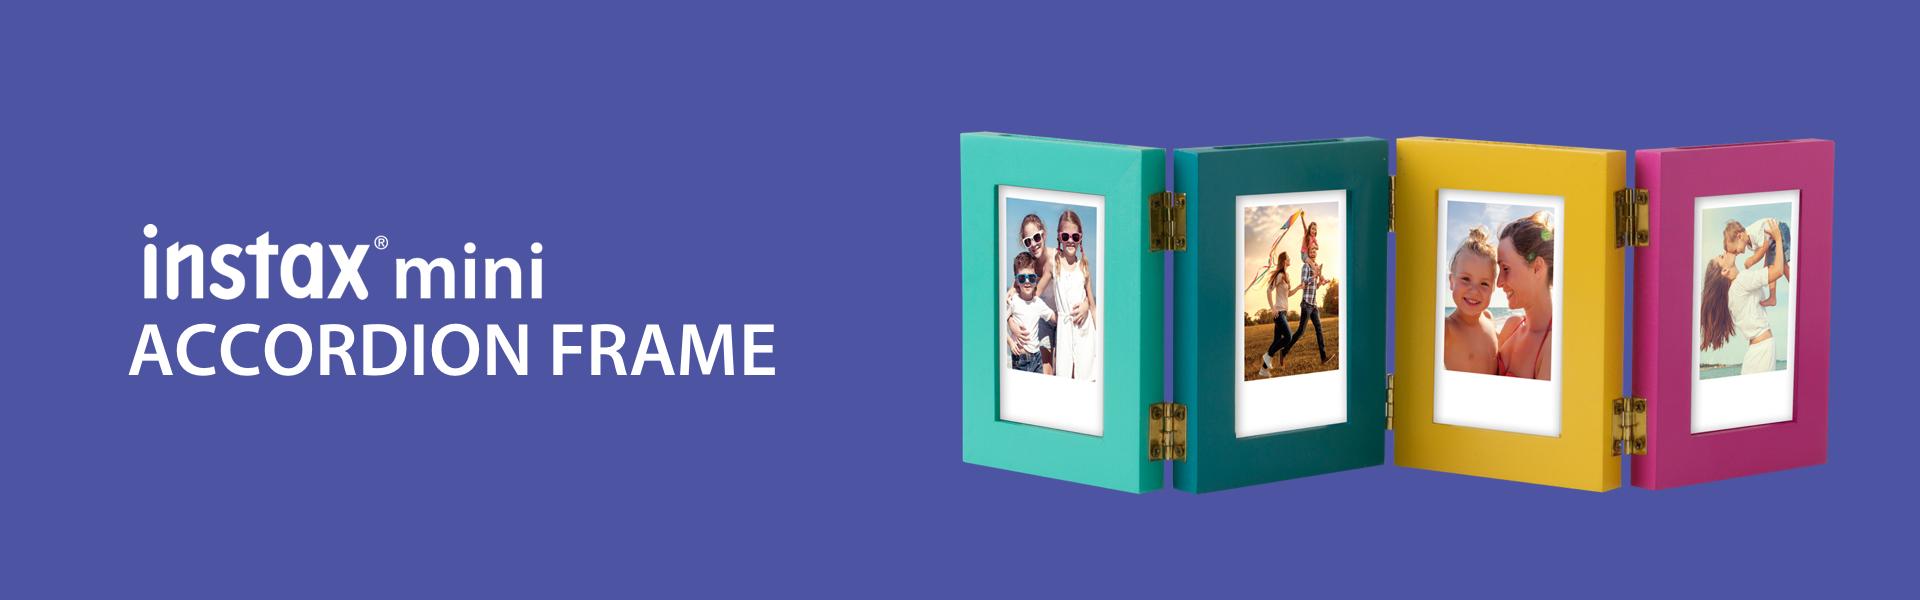 Blue Hero image with Accordion Mini Frame